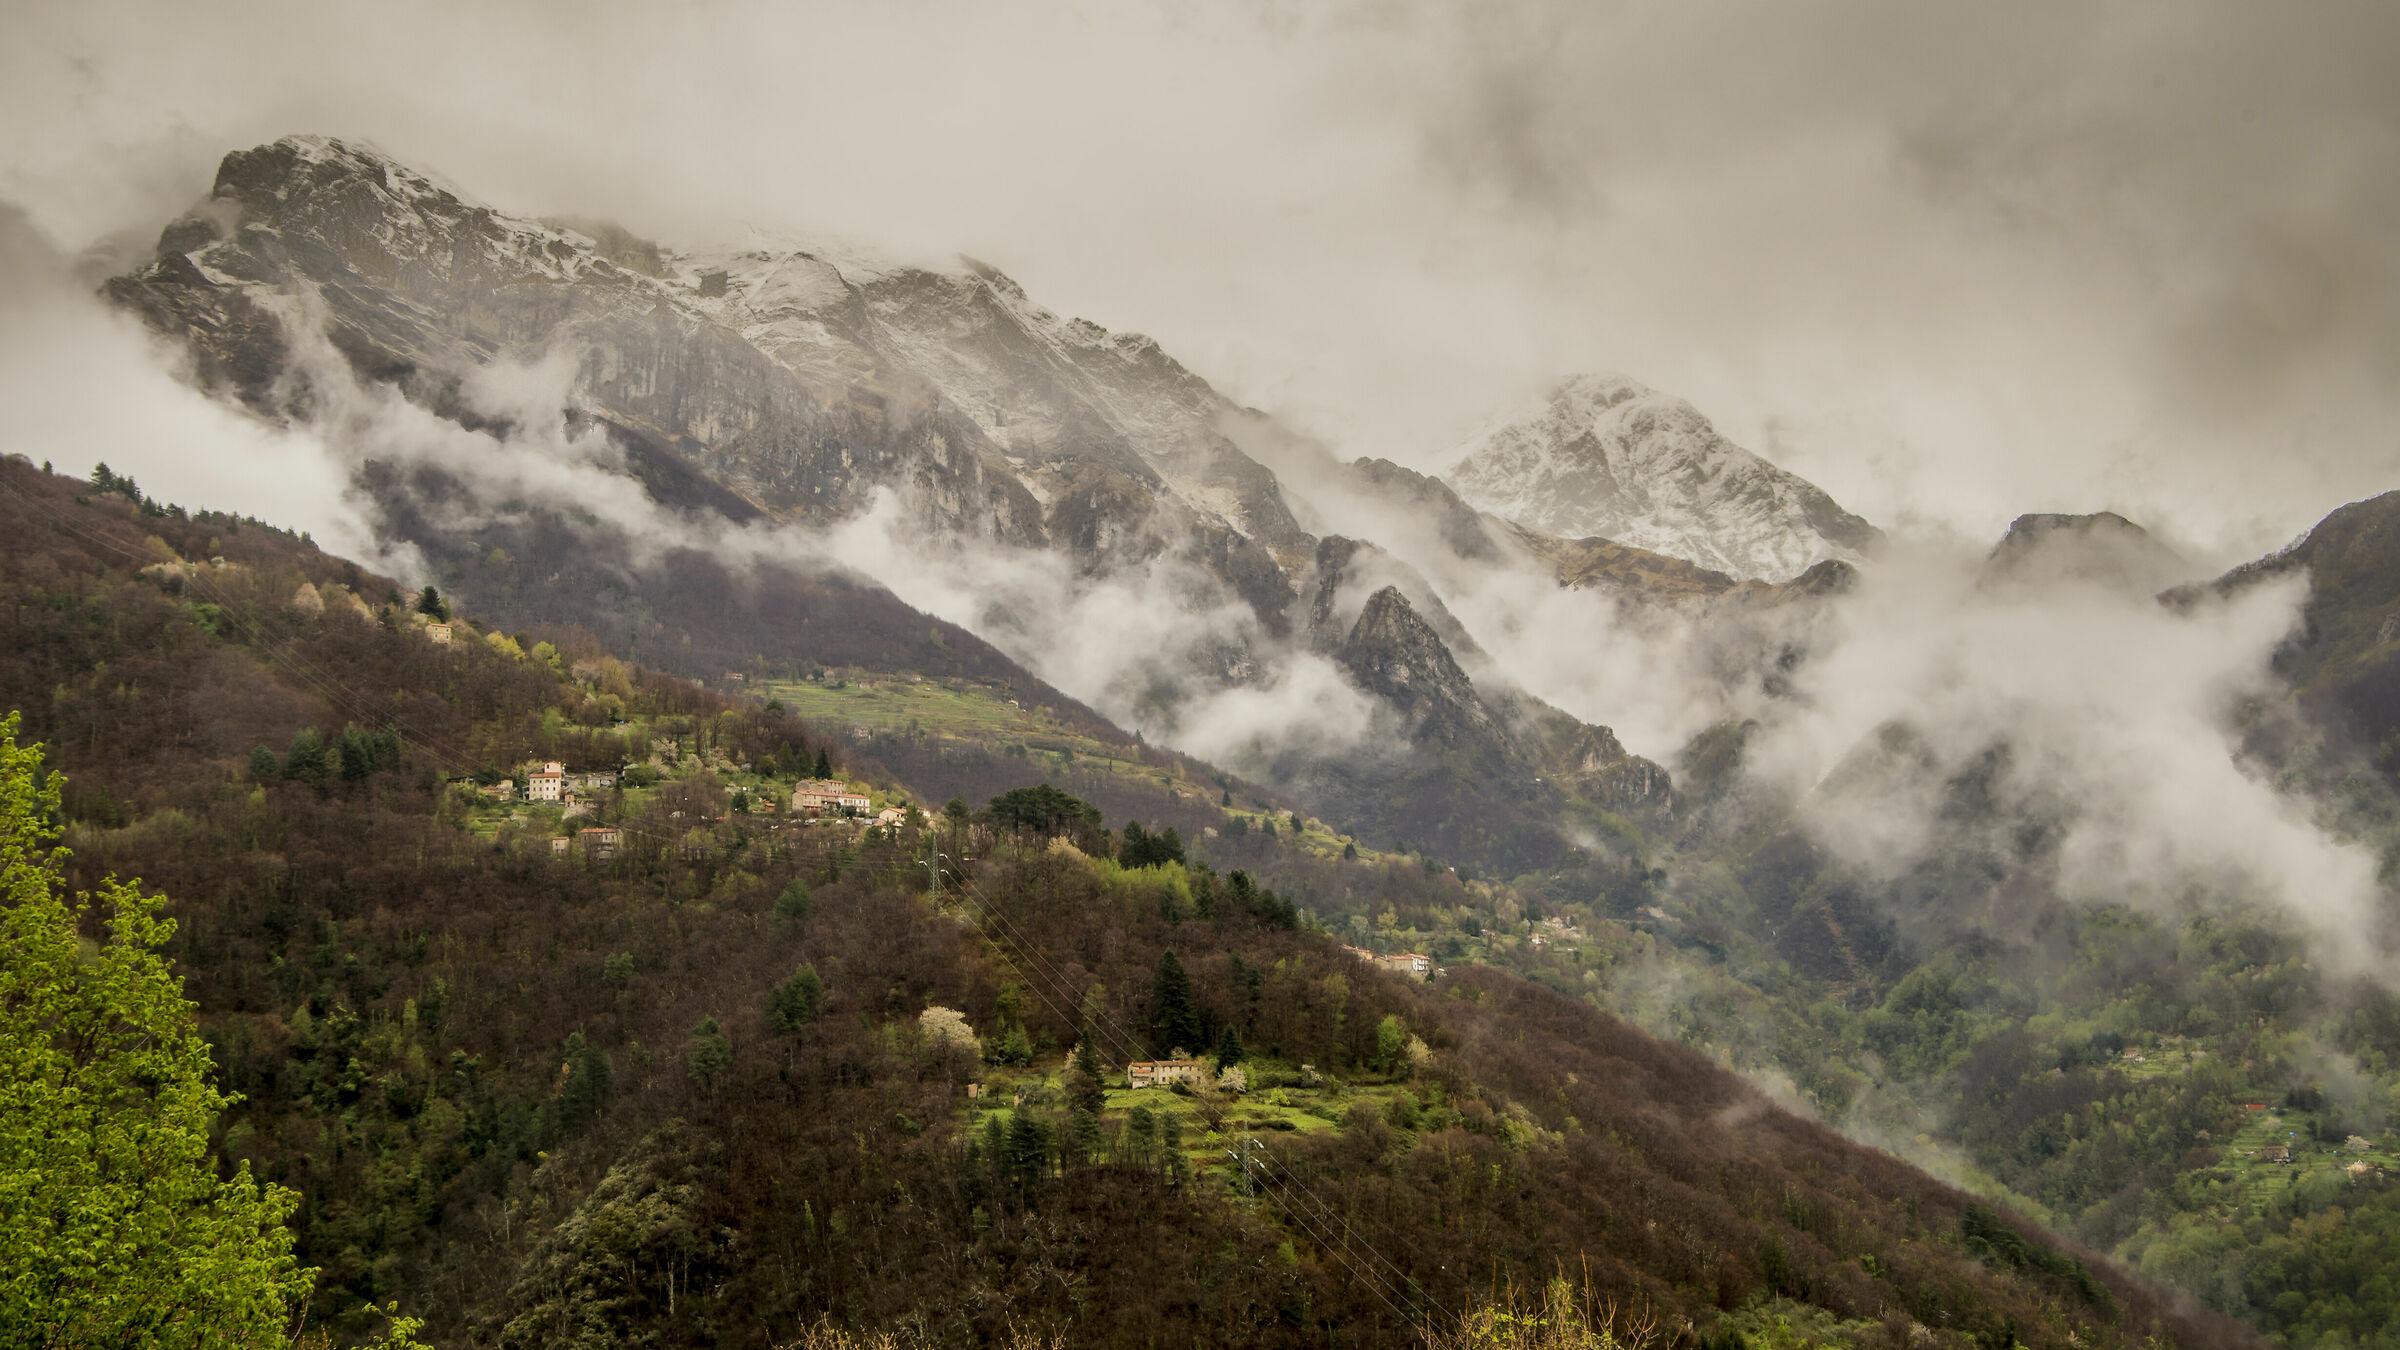 Pania and Corchia Mountains...